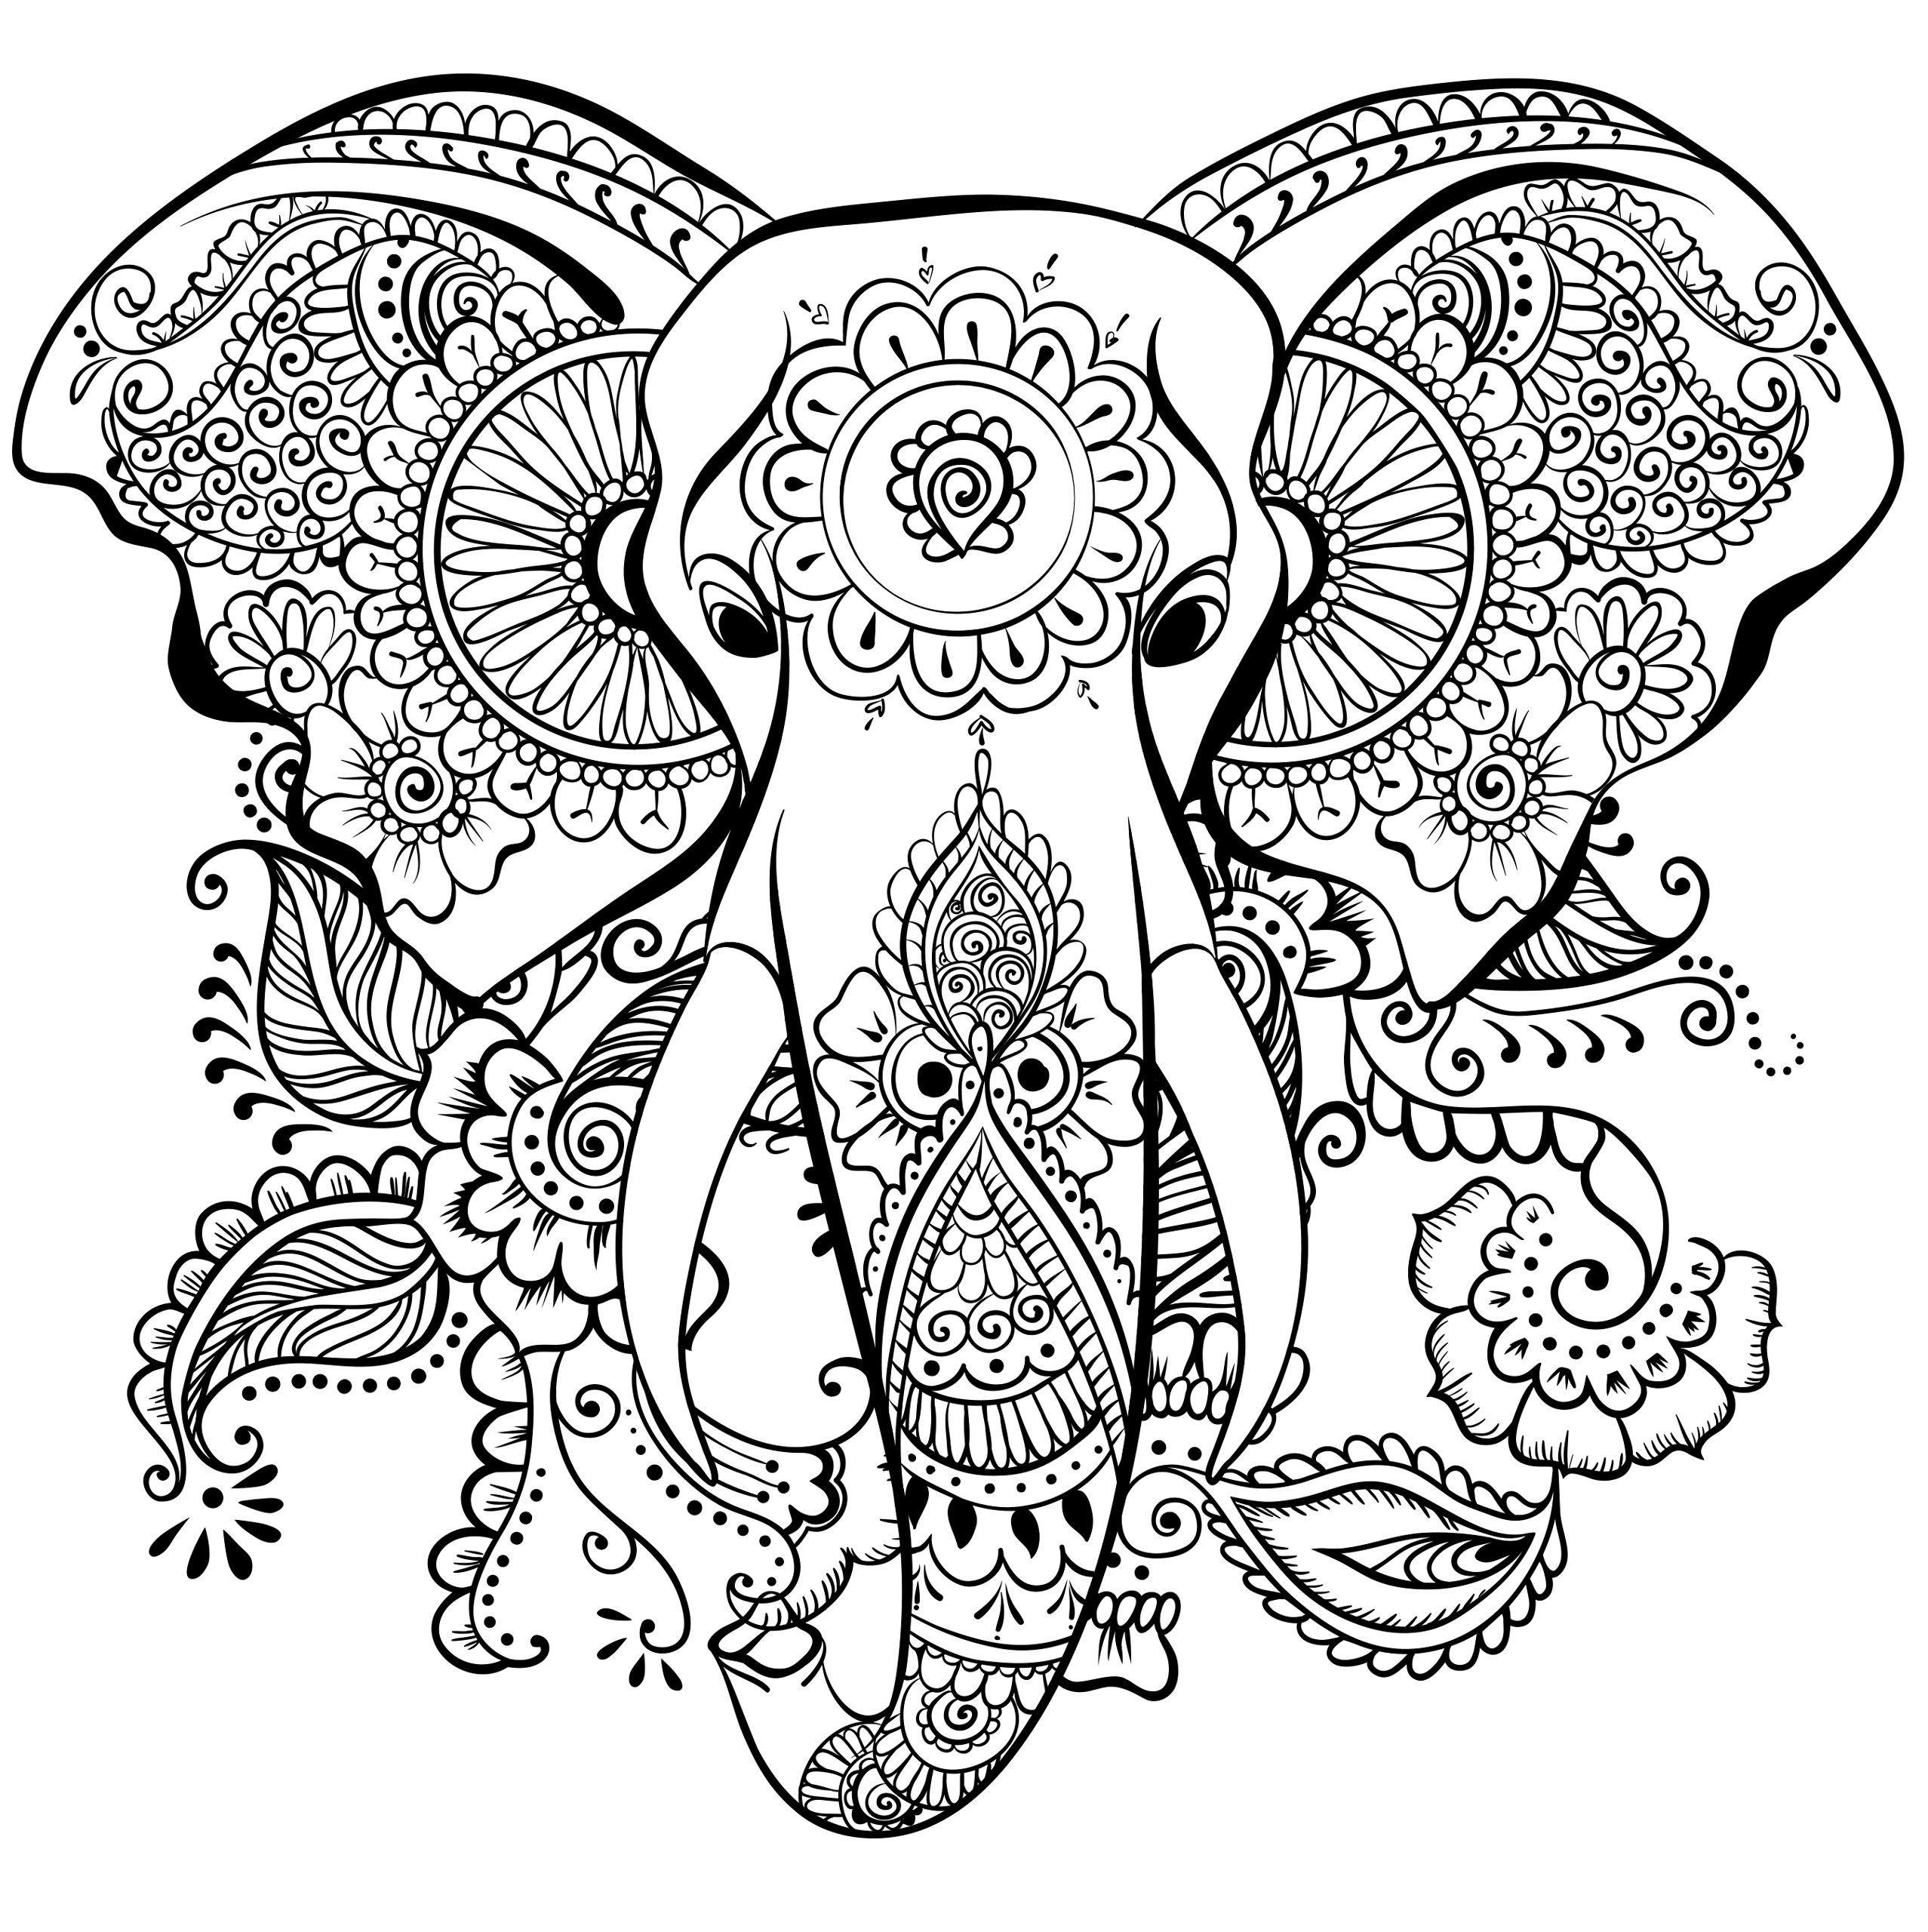 Bildergebnis Fur Ausmalbilder Mandala Ausmalbilder Zum Ausdrucken Mandala Elefant Ausmalbilder